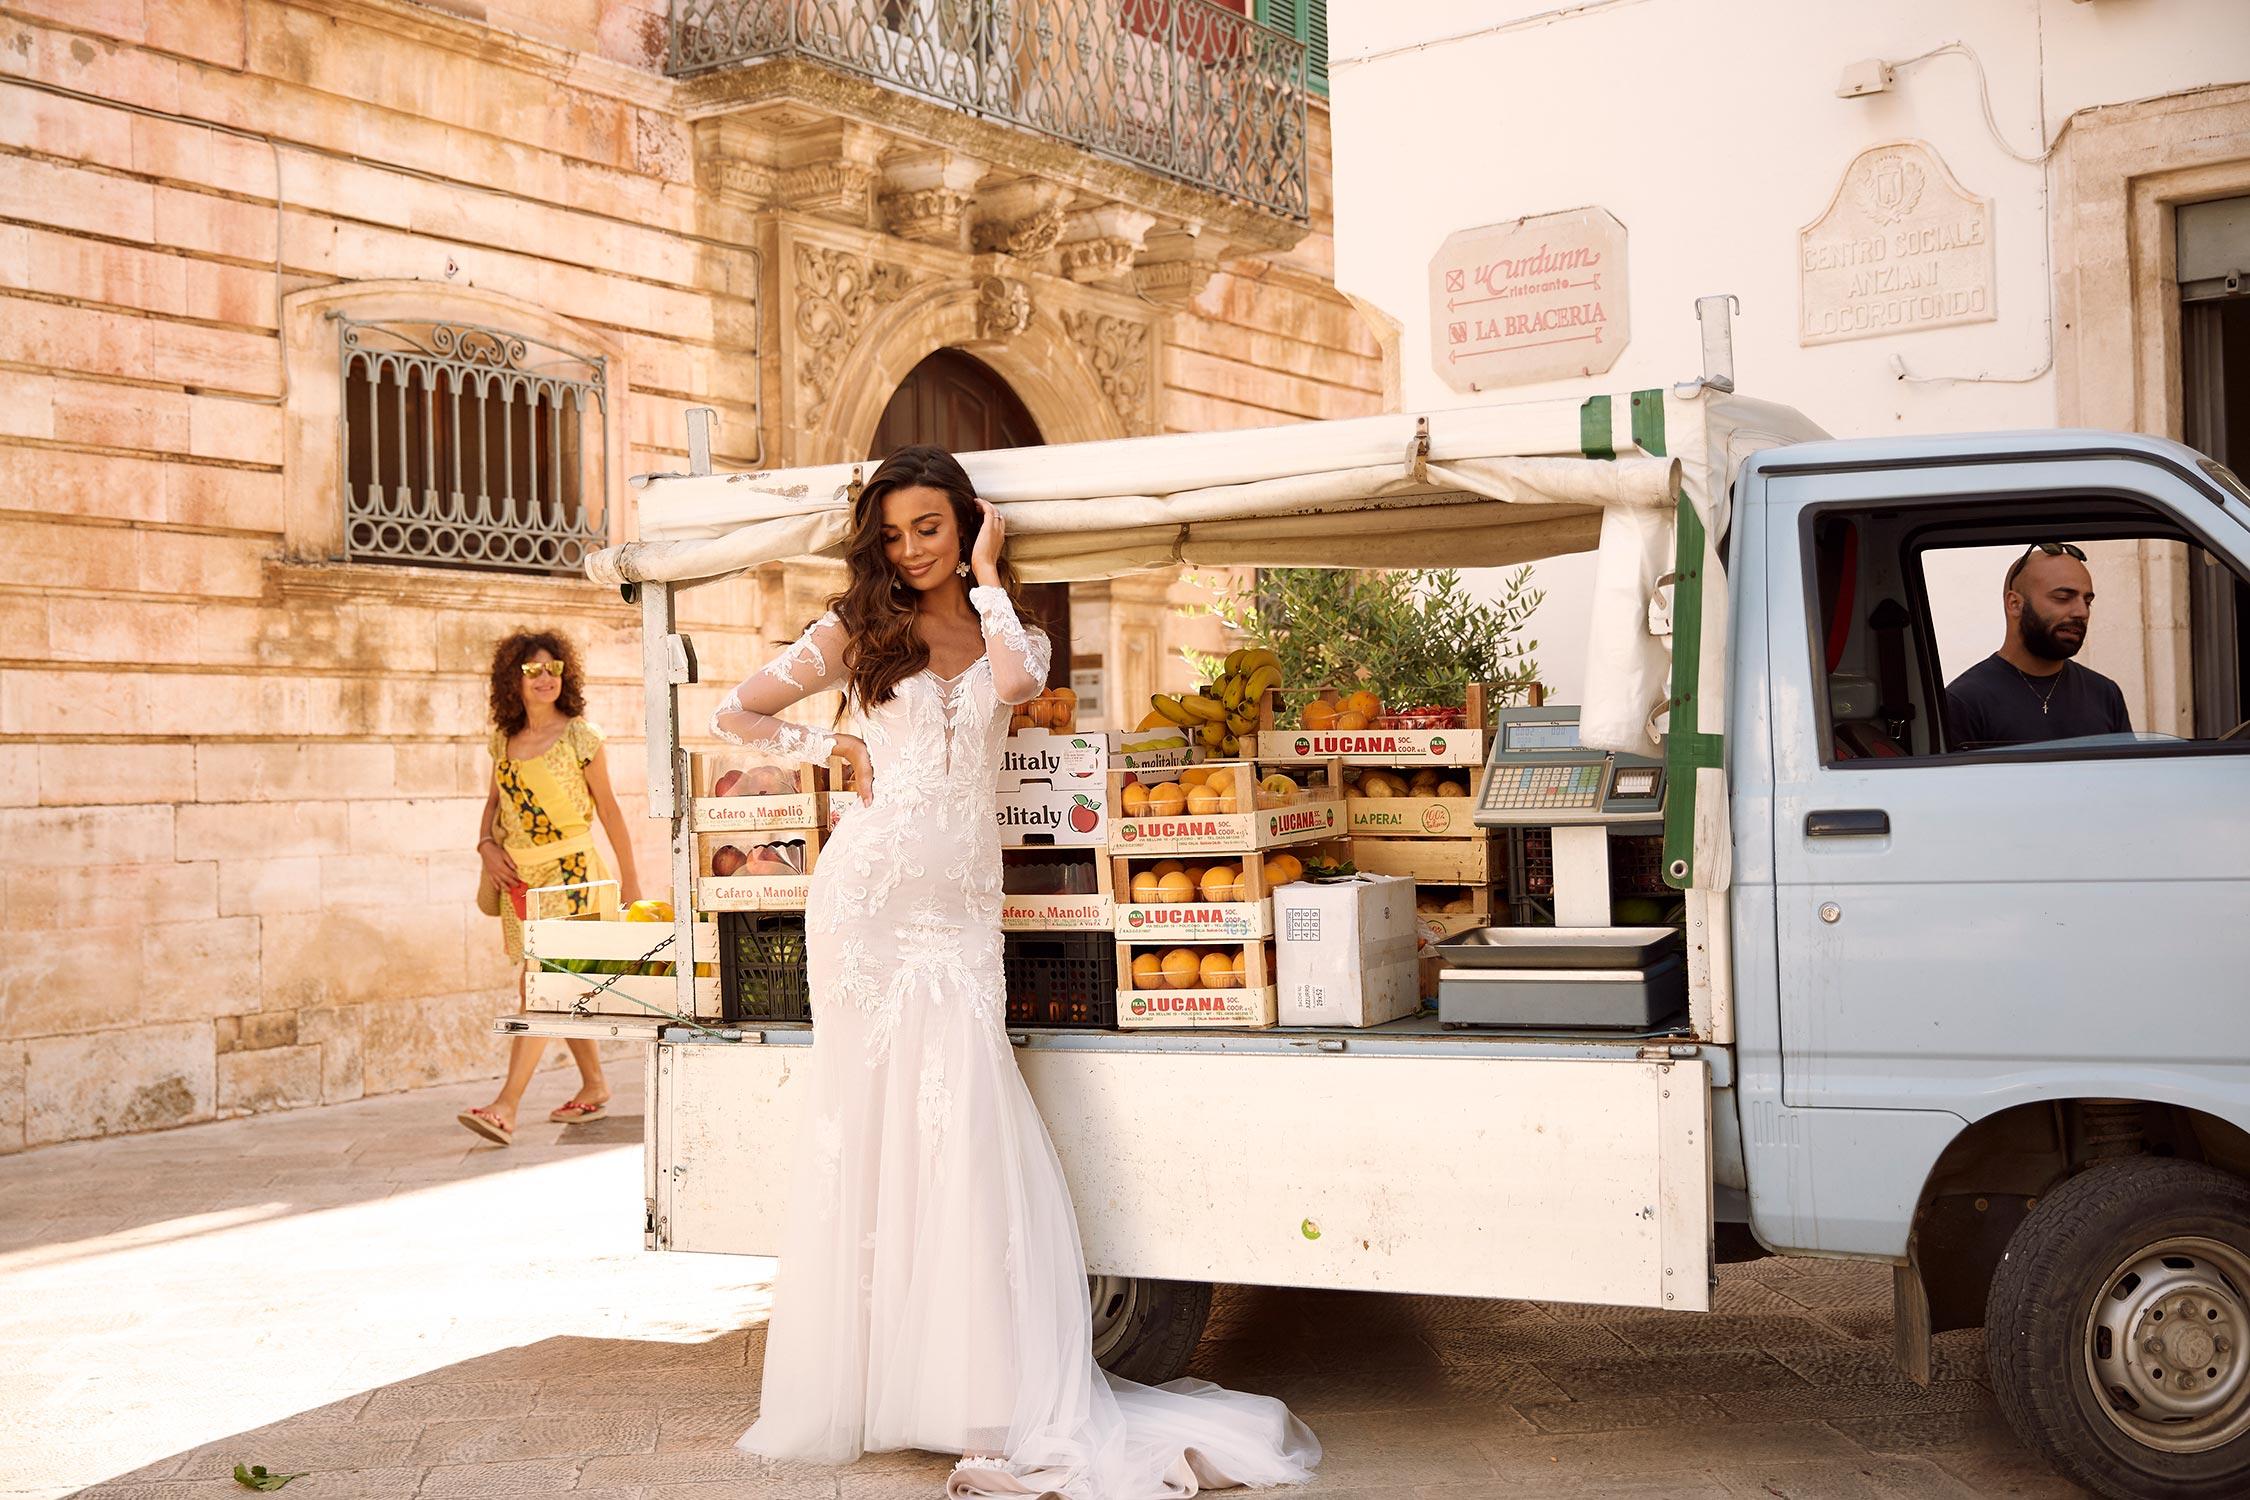 Mackenzie Ml11888 Plunging Neck Keyhole Back With Sleeves And Floral Lace Wedding Dress Madi Lane Bridal2